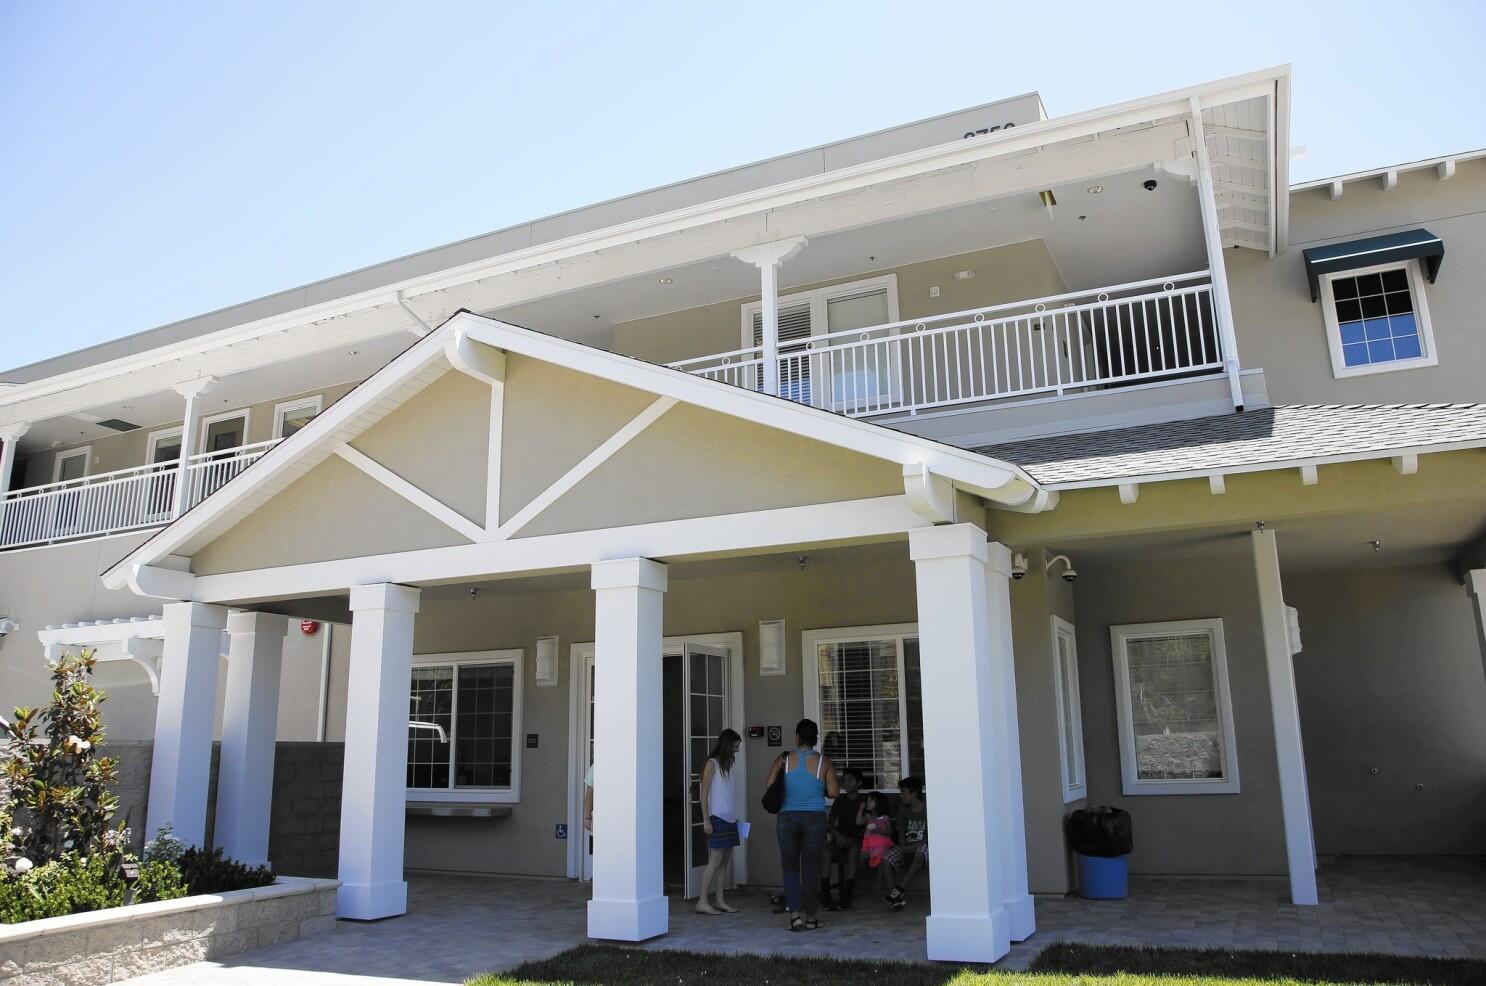 New, bigger shelter plans warm welcome for homeless San Fernando ...